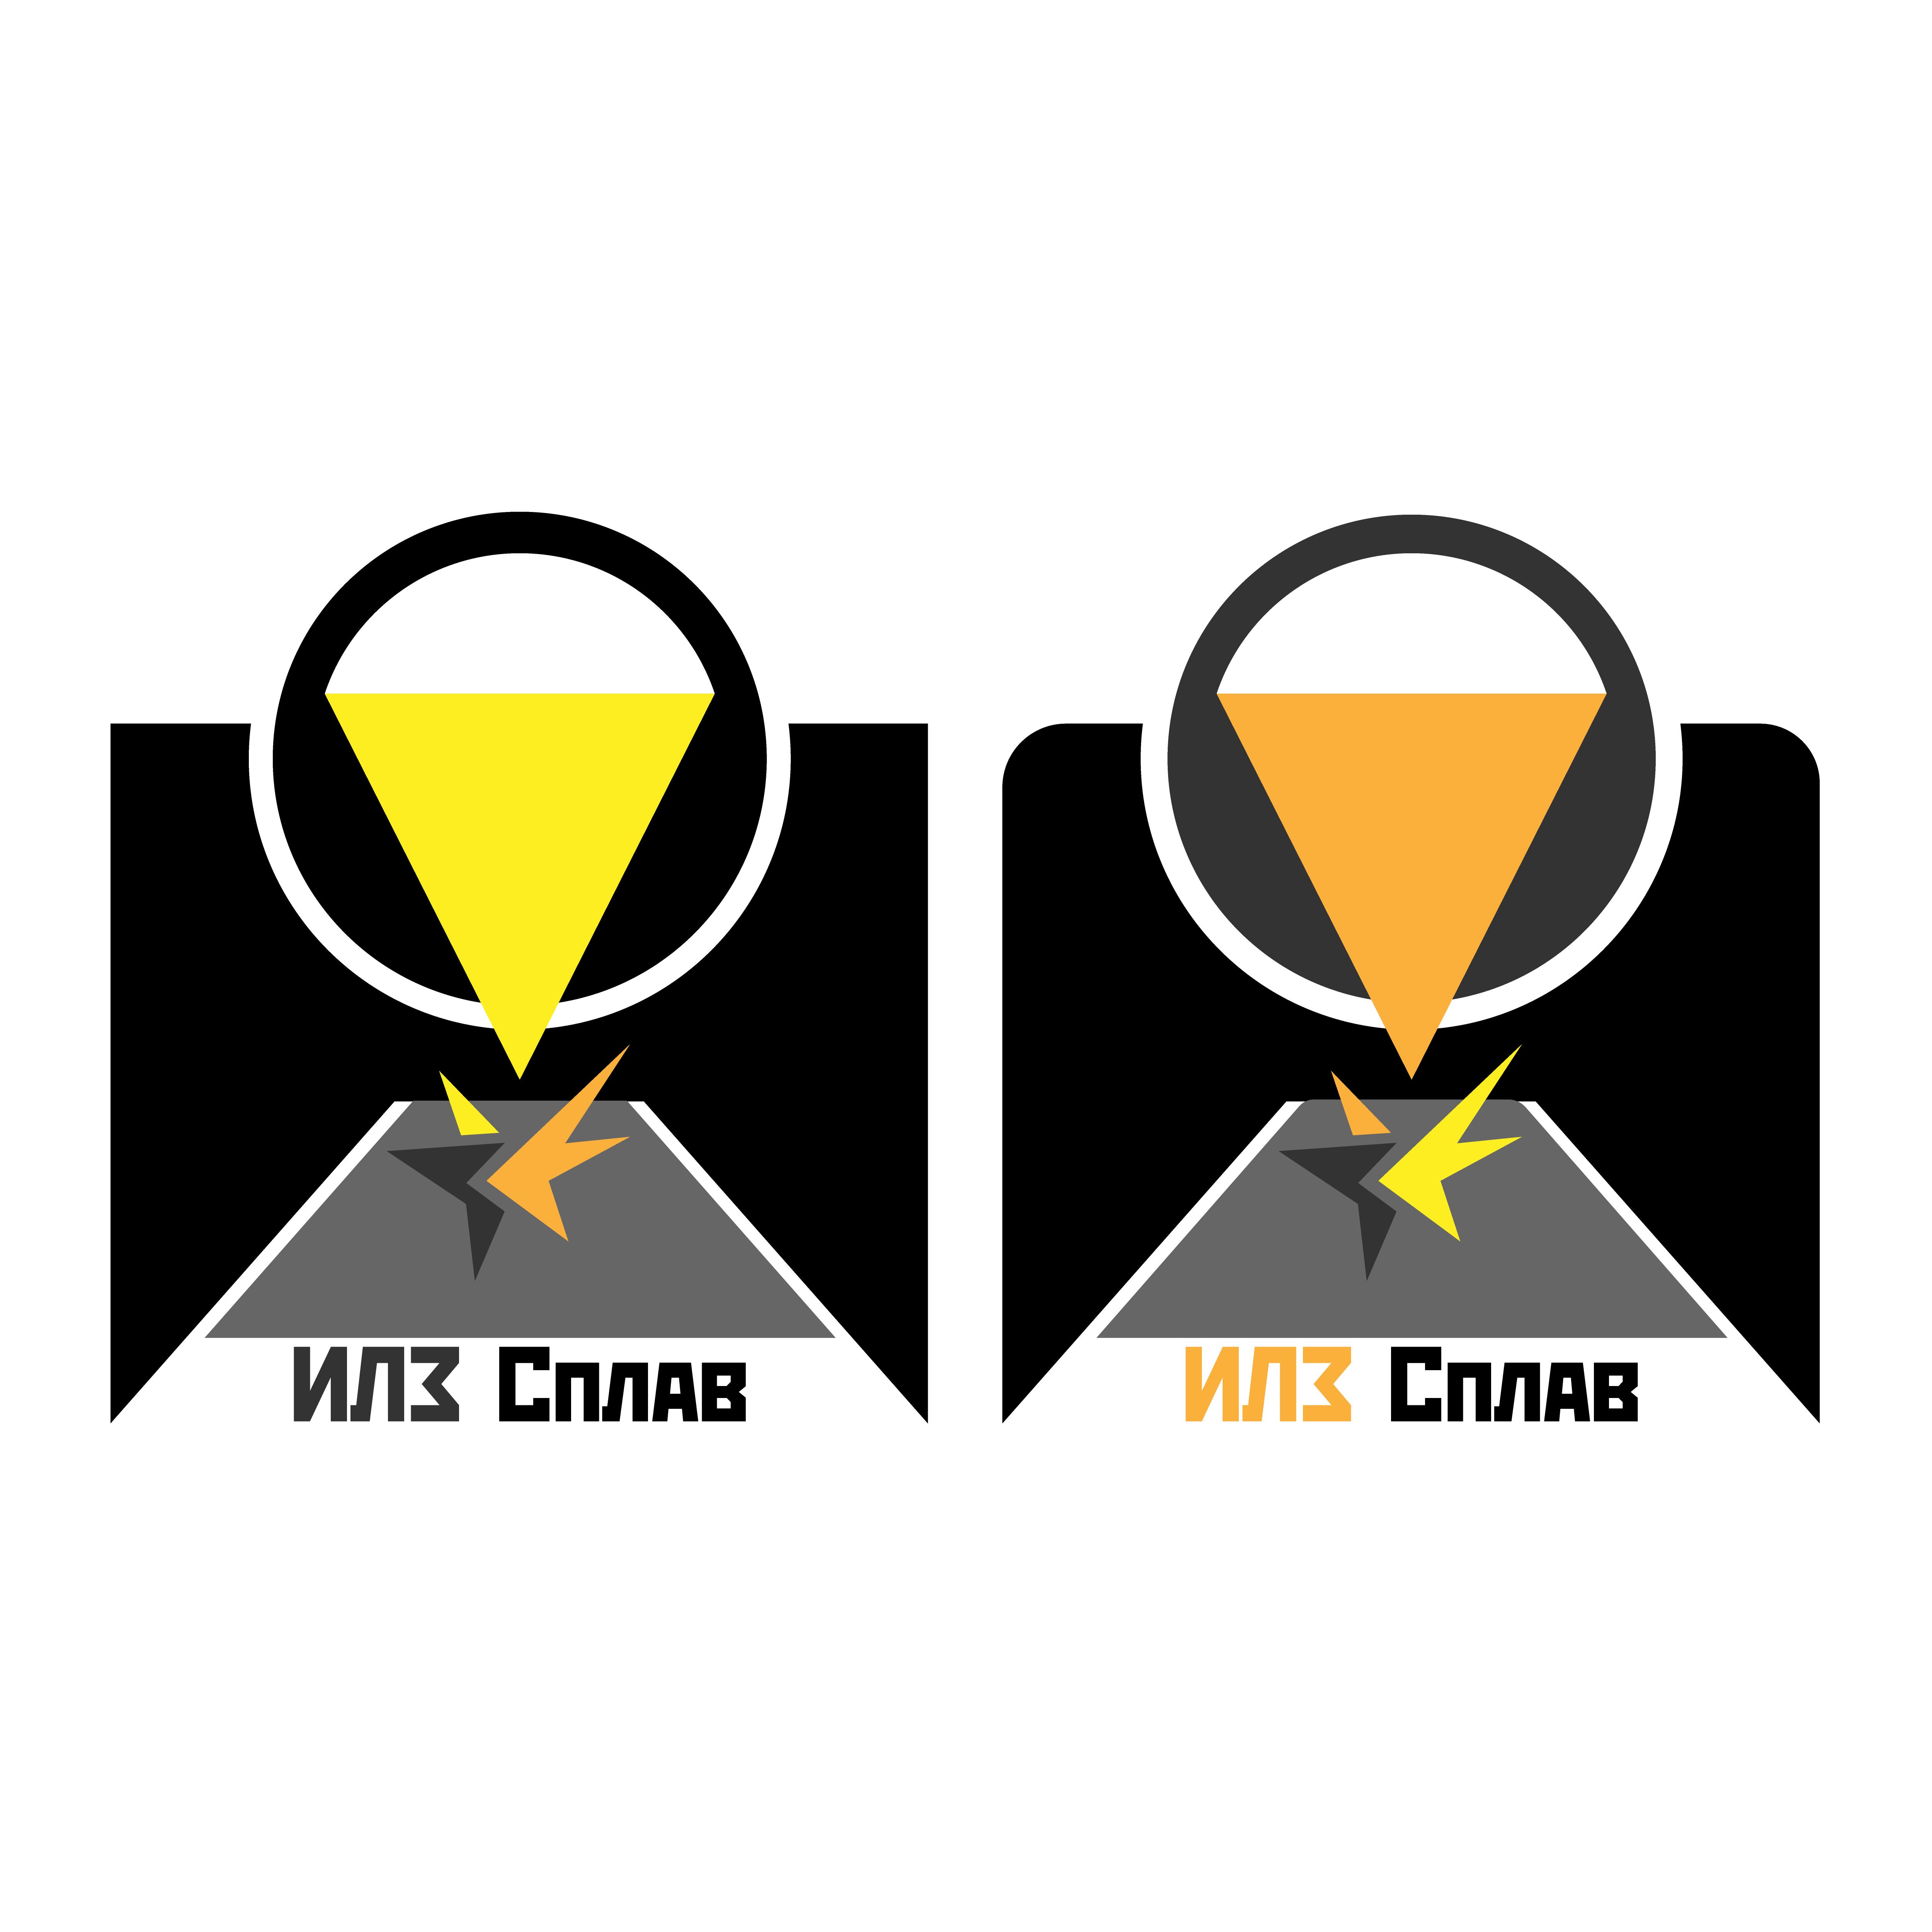 Разработать логотип для литейного завода фото f_2585b02c496162a7.jpg